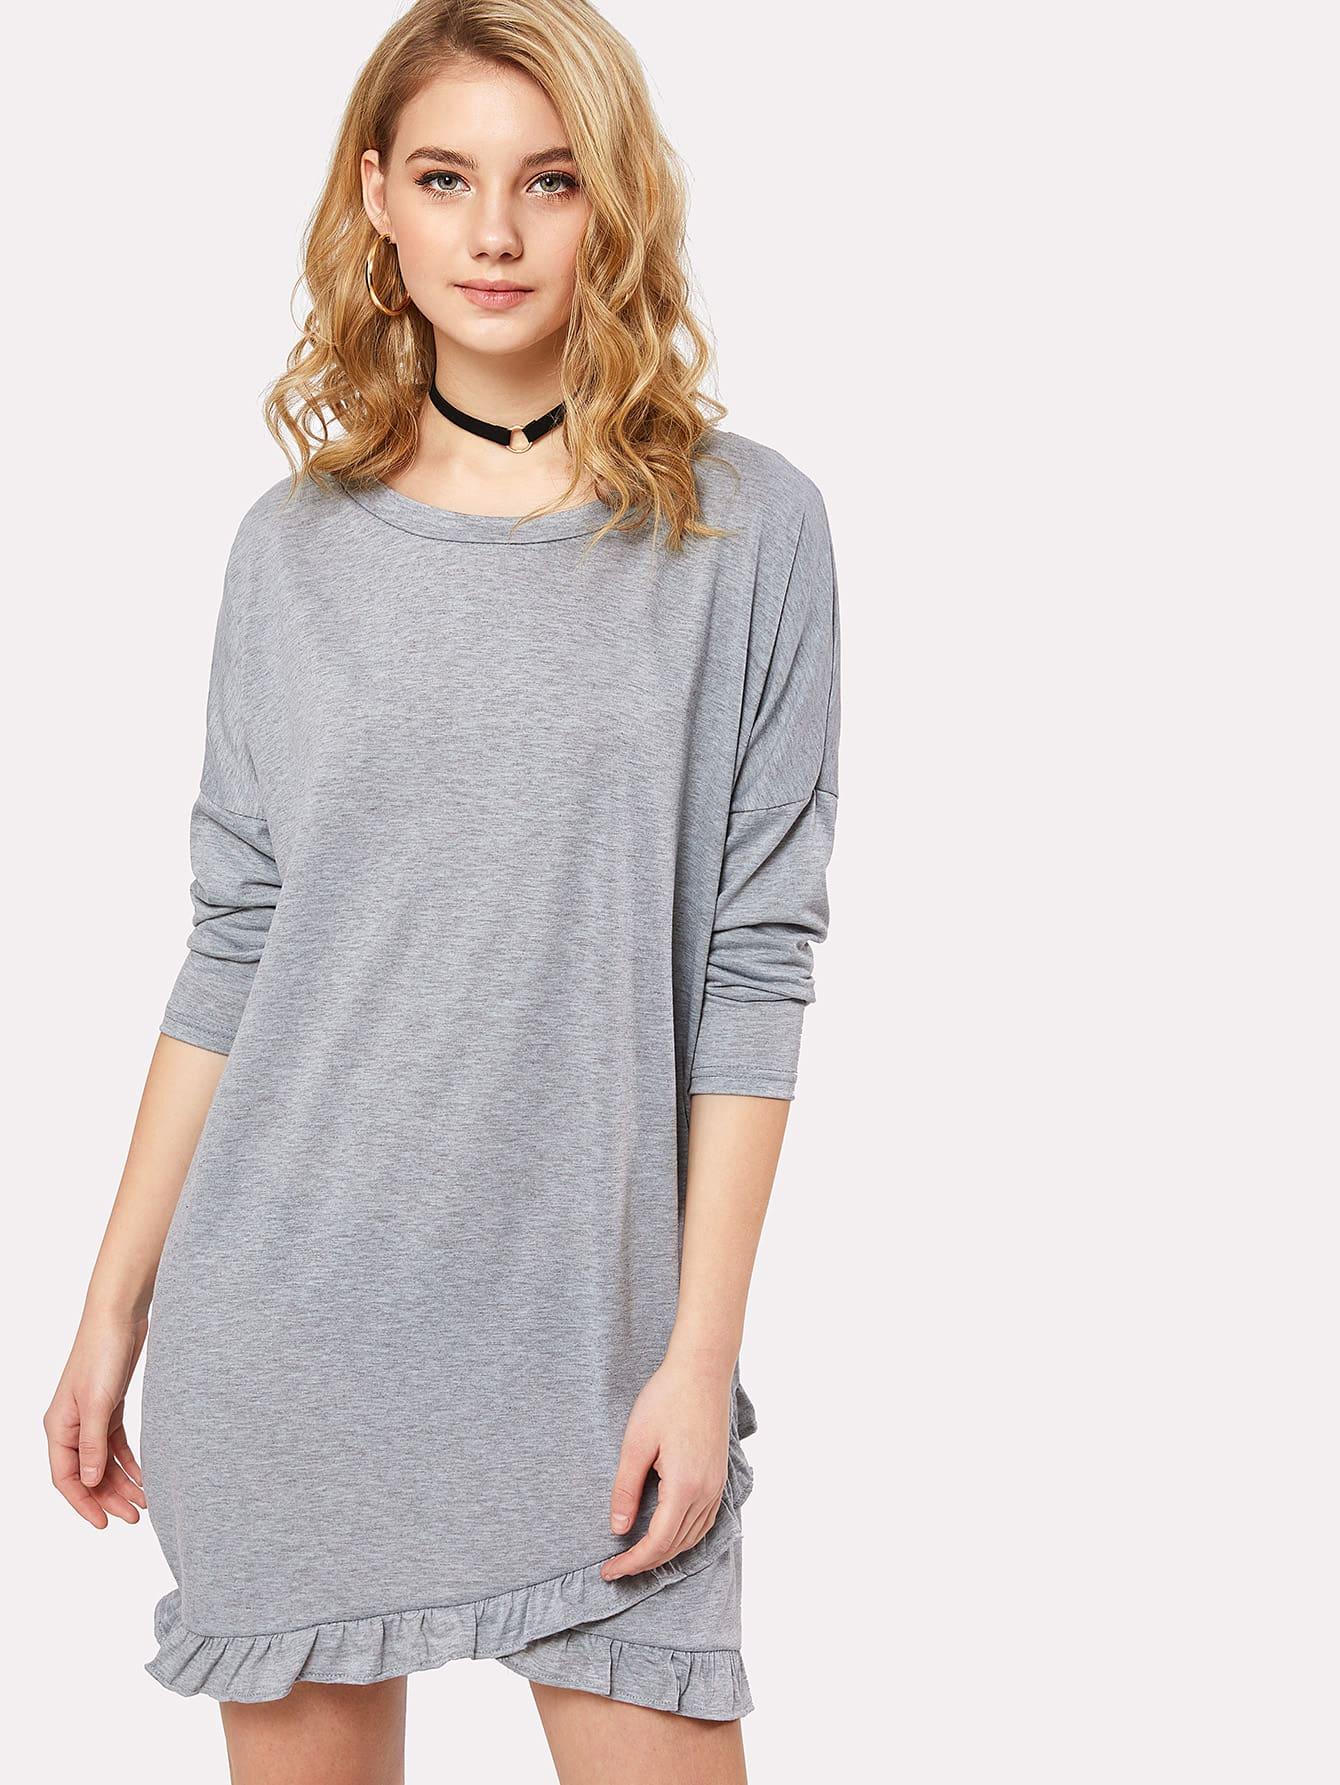 Drop Shoulder Ruffle Trim Marled Dress drop shoulder marled sweatshirt dress with corset belt